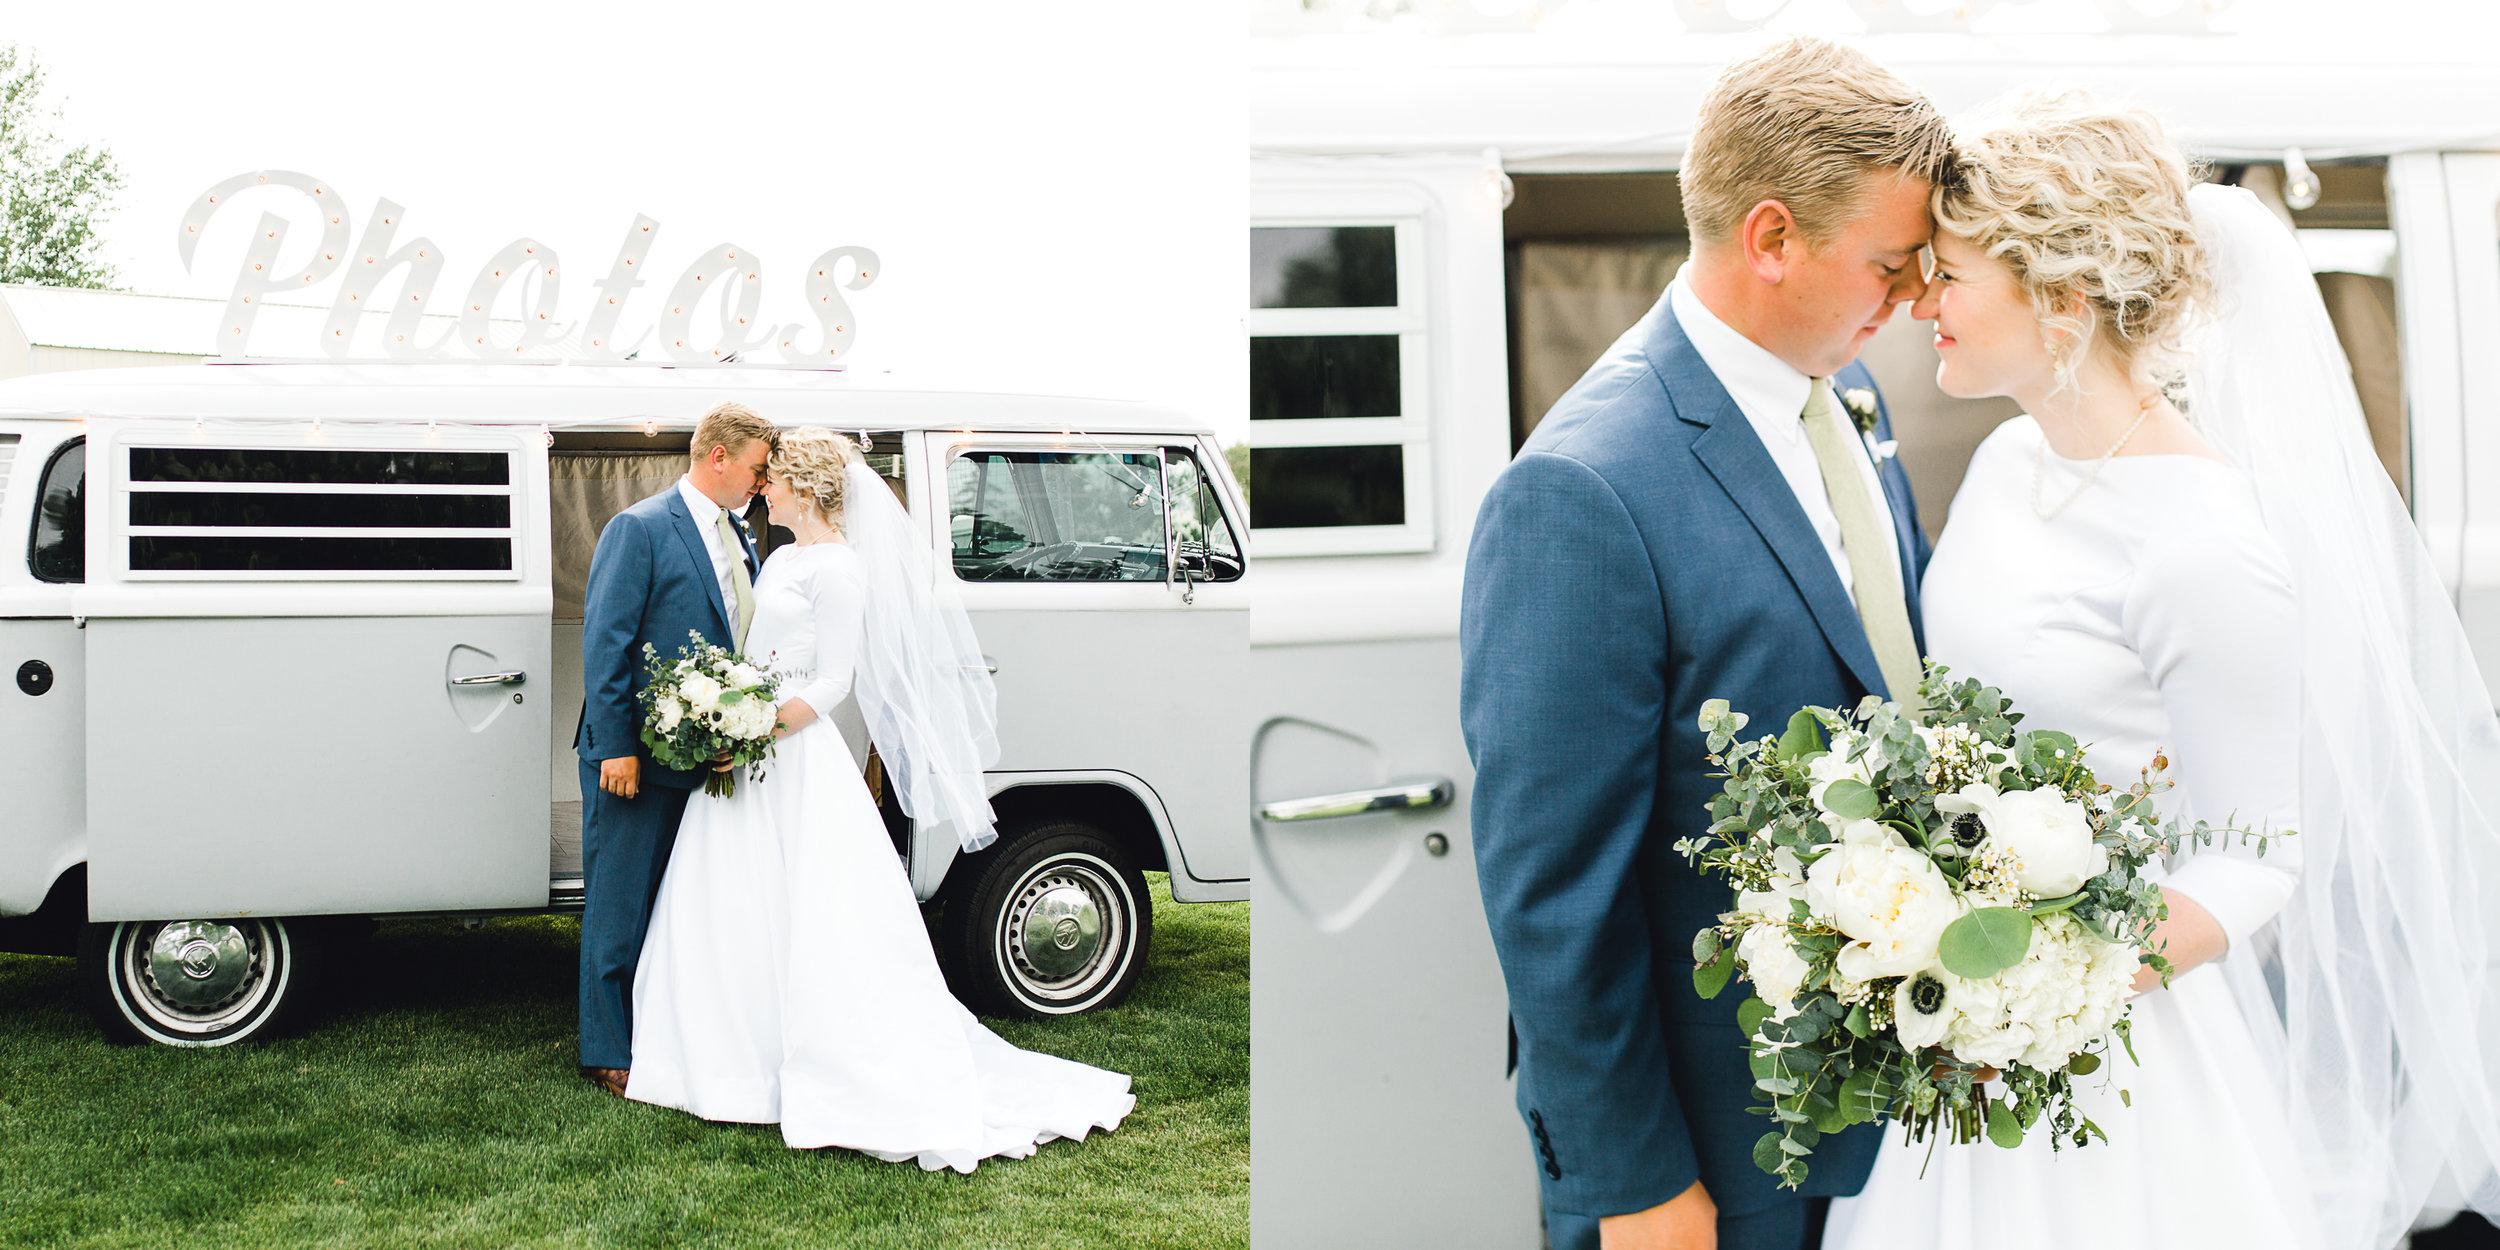 beautiful-outdoor-backyard-wedding-reception-anna-christine-photography-rexburg-idaho-11.jpg